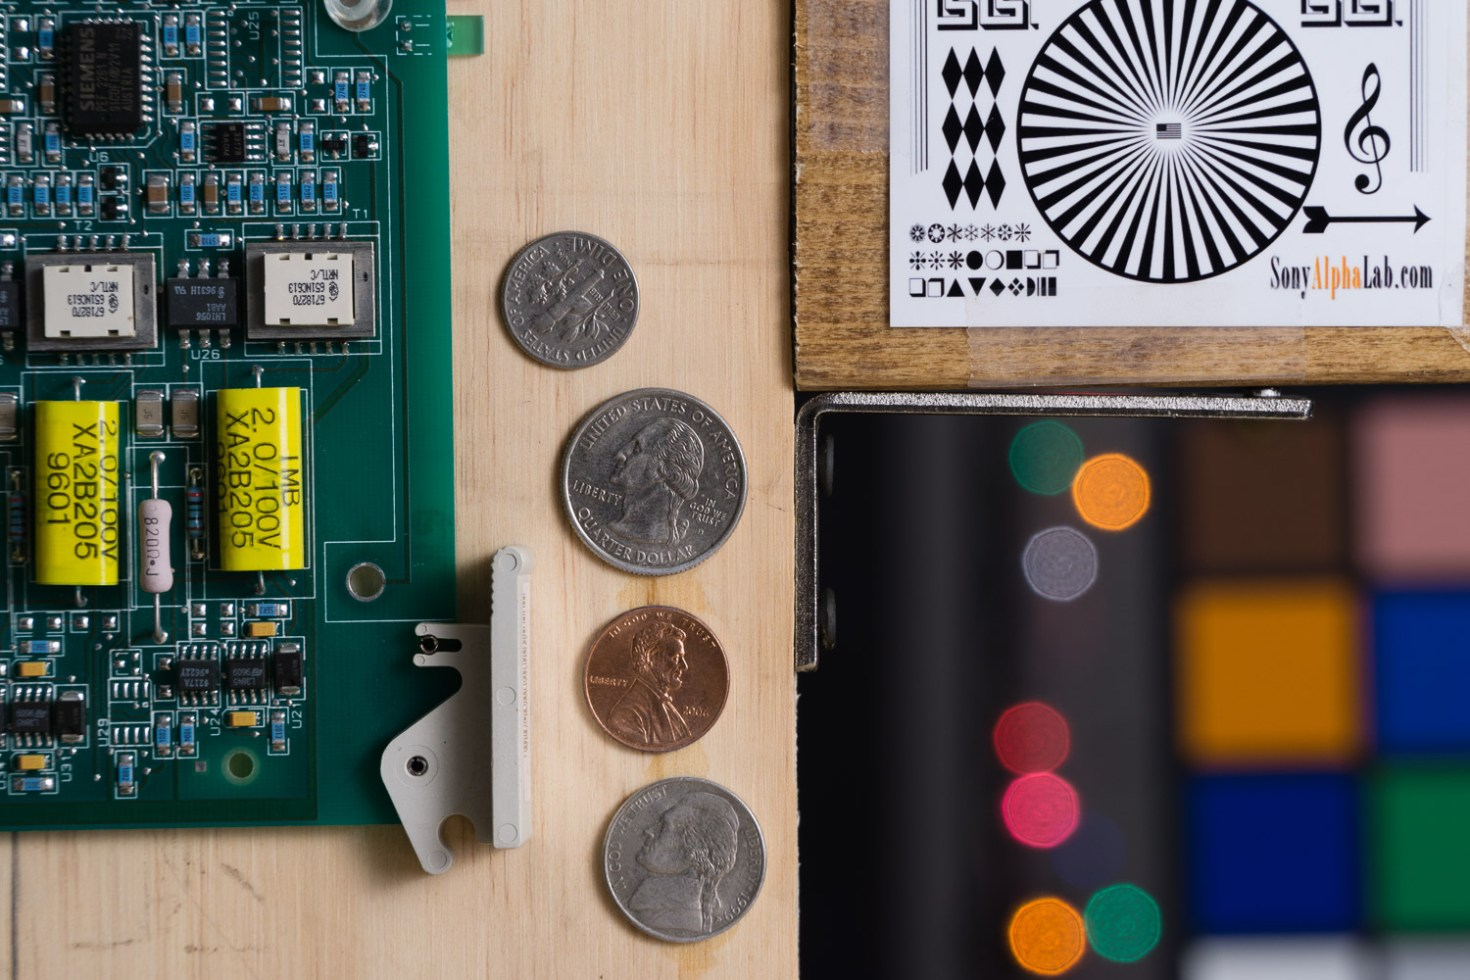 Sony A6000 w/ 18-105mm f/4 OSS G Lens @ 105mm, f/8